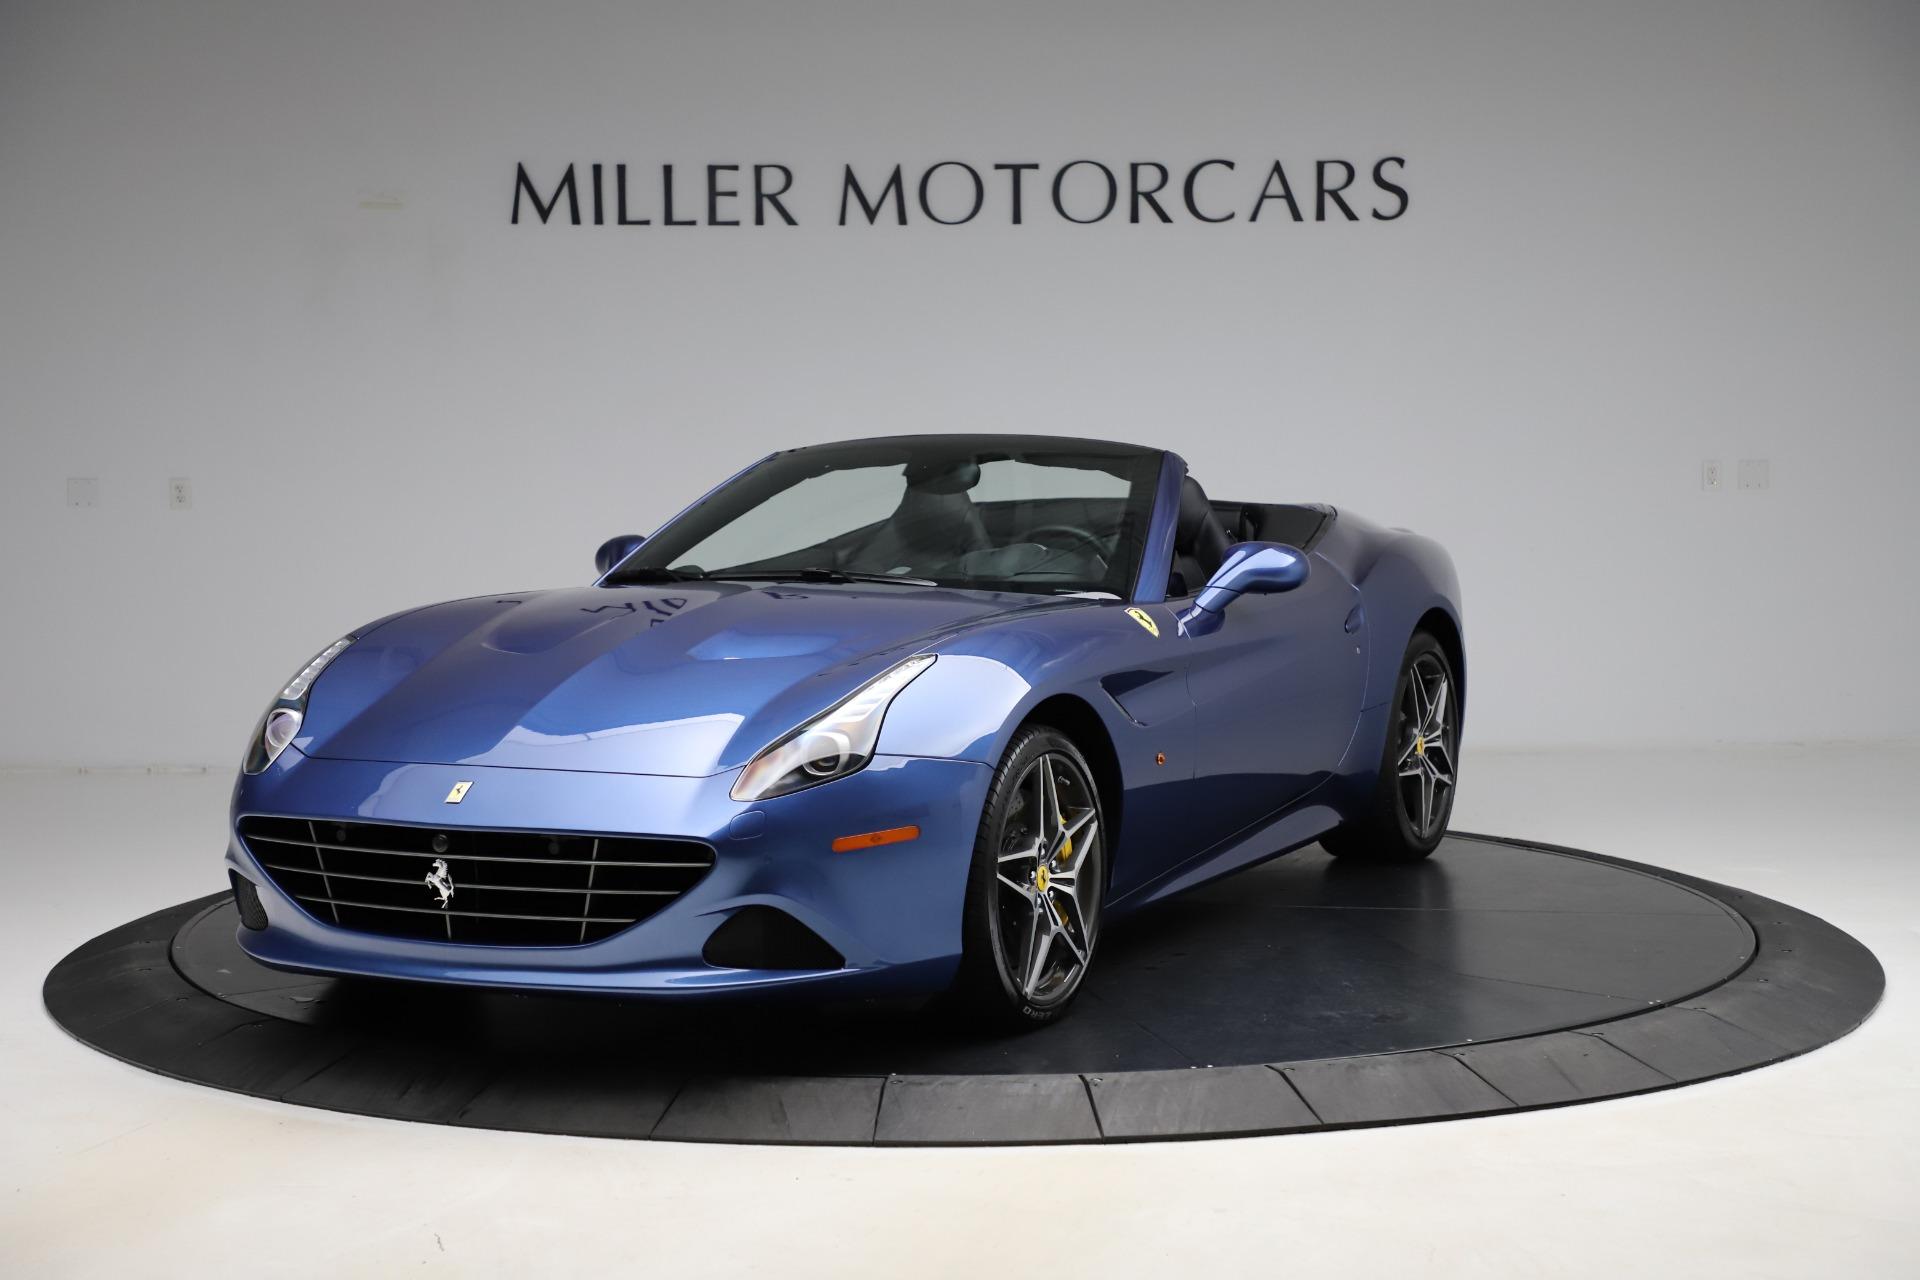 Used 2018 Ferrari California T for sale $185,900 at Alfa Romeo of Greenwich in Greenwich CT 06830 1